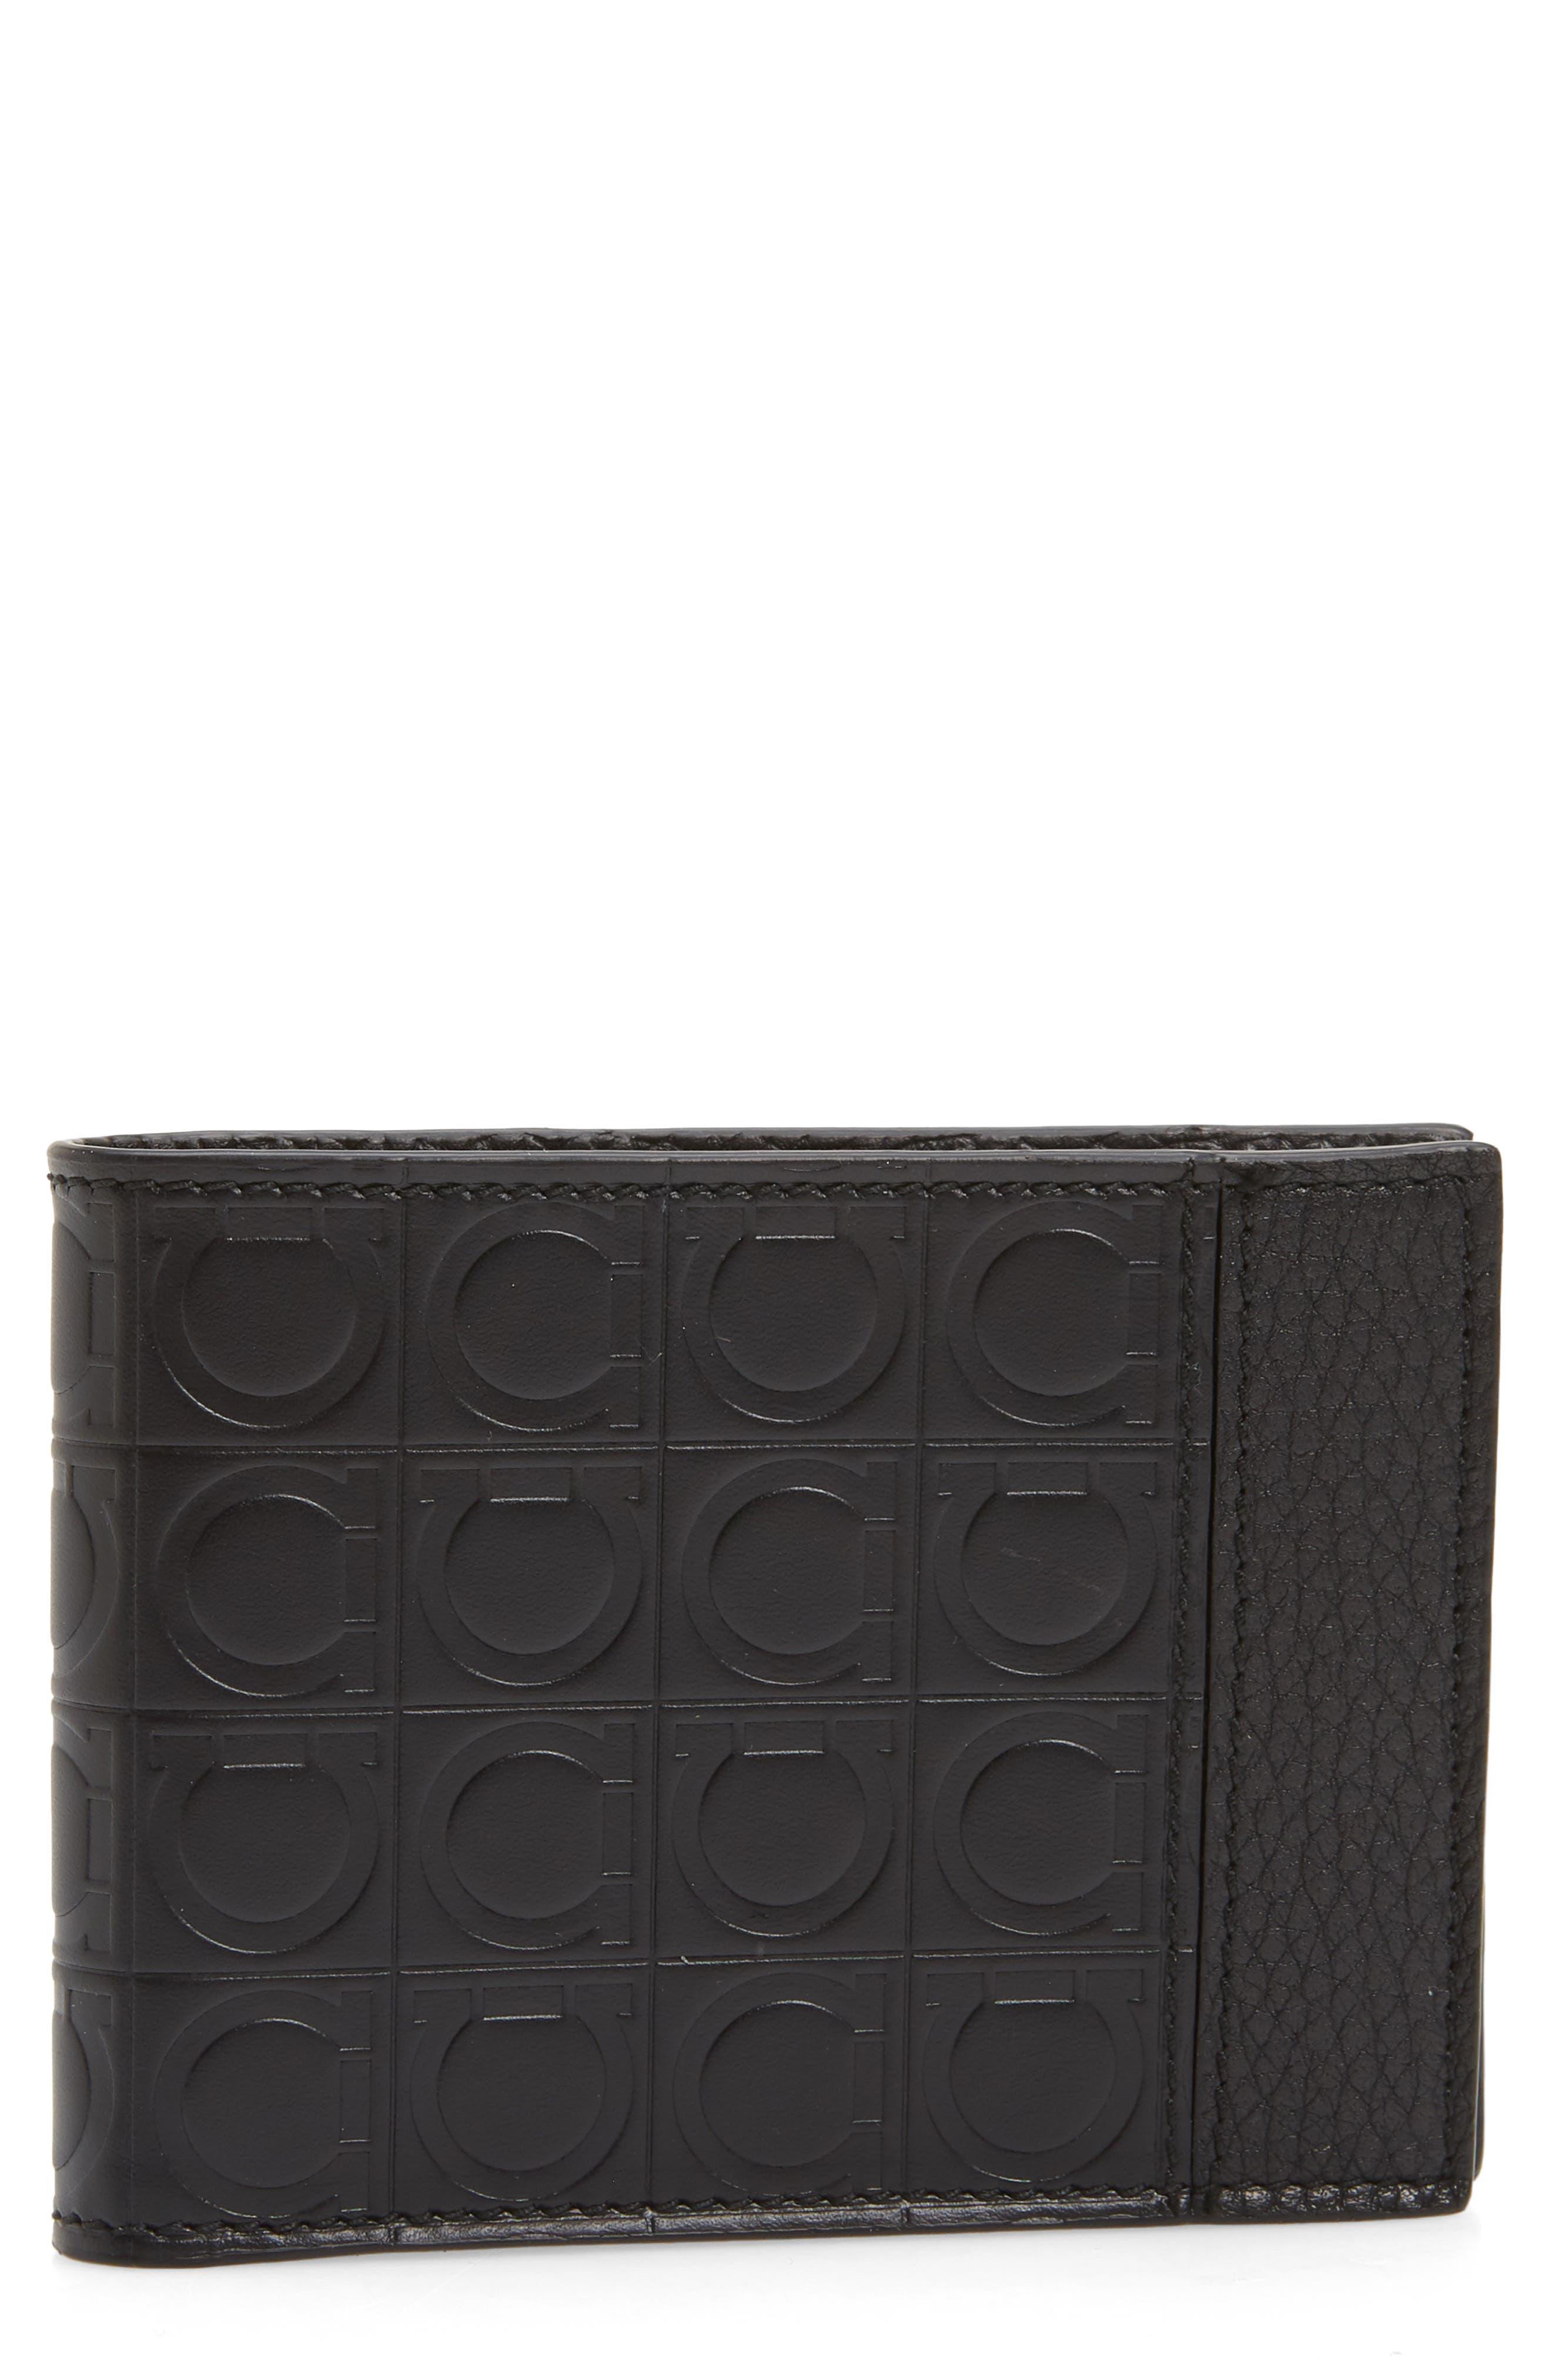 Alternate Image 1 Selected - Salvatore Ferragamo Firenze Gamma Leather Wallet